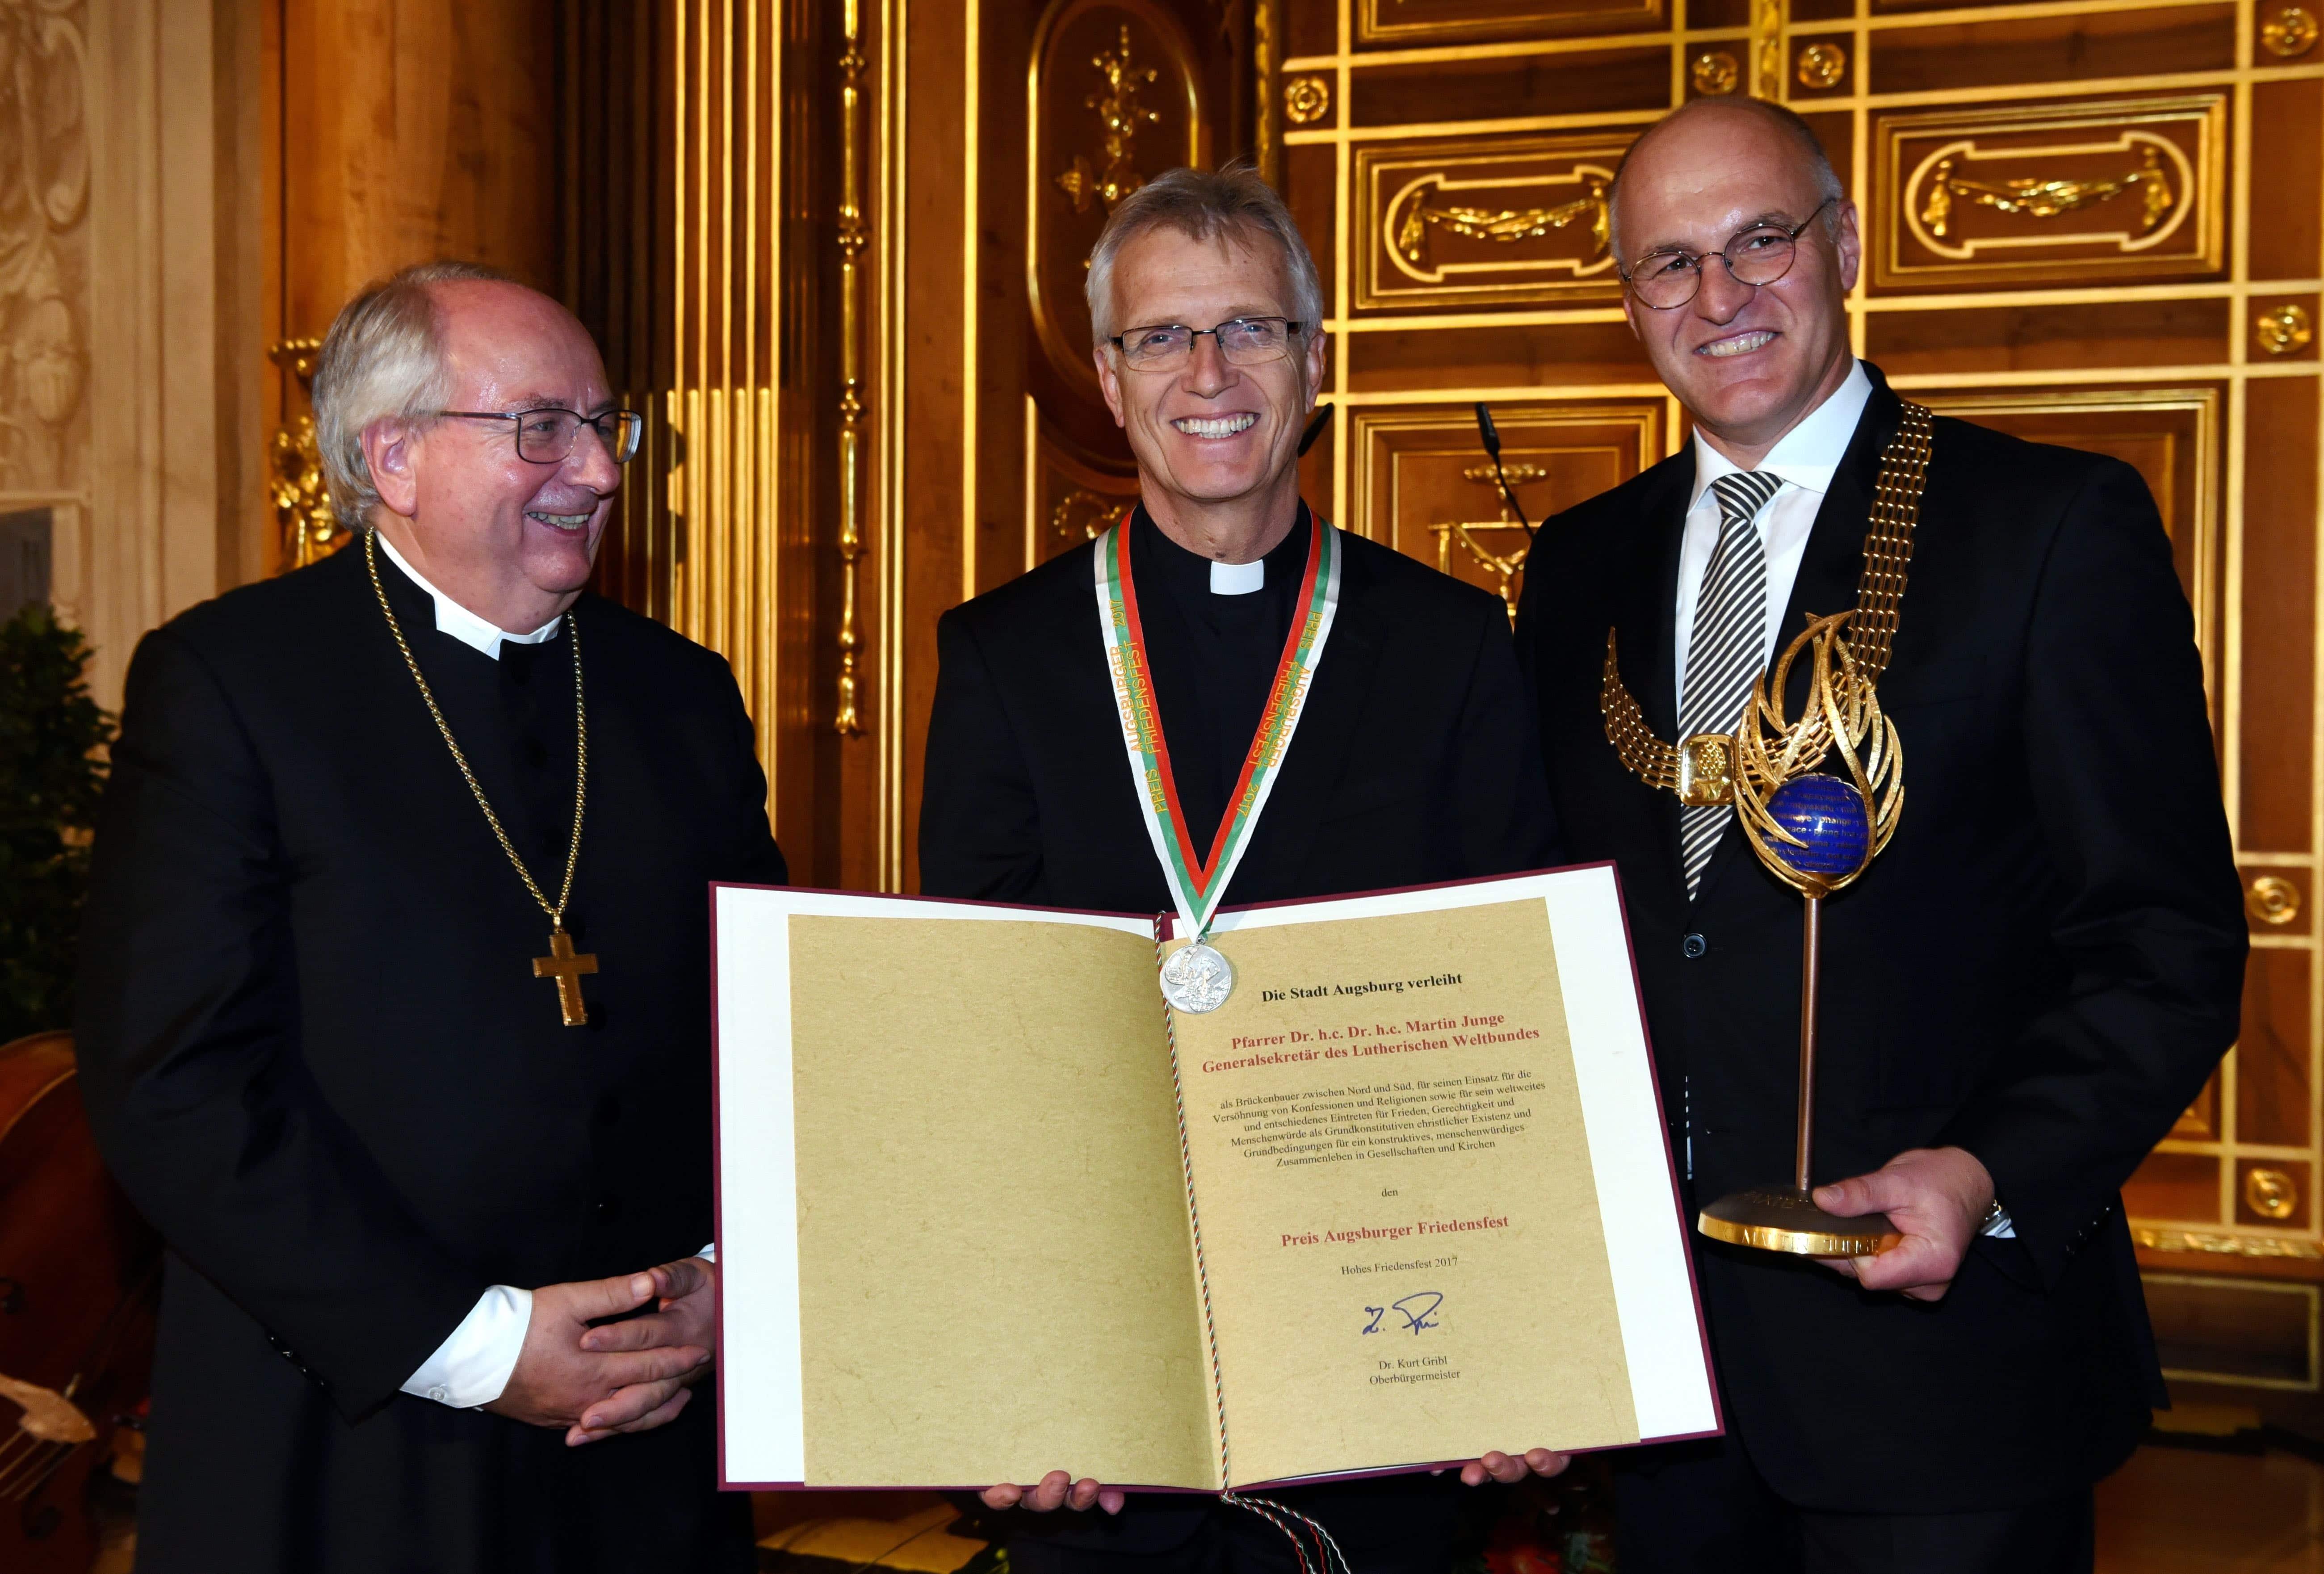 "Verleihung ""Preis Augsburger Friedensfest"" 2017 v.l. Regionalbischof Michael Grabow, Dr. h.c. Dr. h.c. Martin Junge, OB Dr. Kurt Gribl -- Foto: Stadt Augsburg/Ruth Plössel"